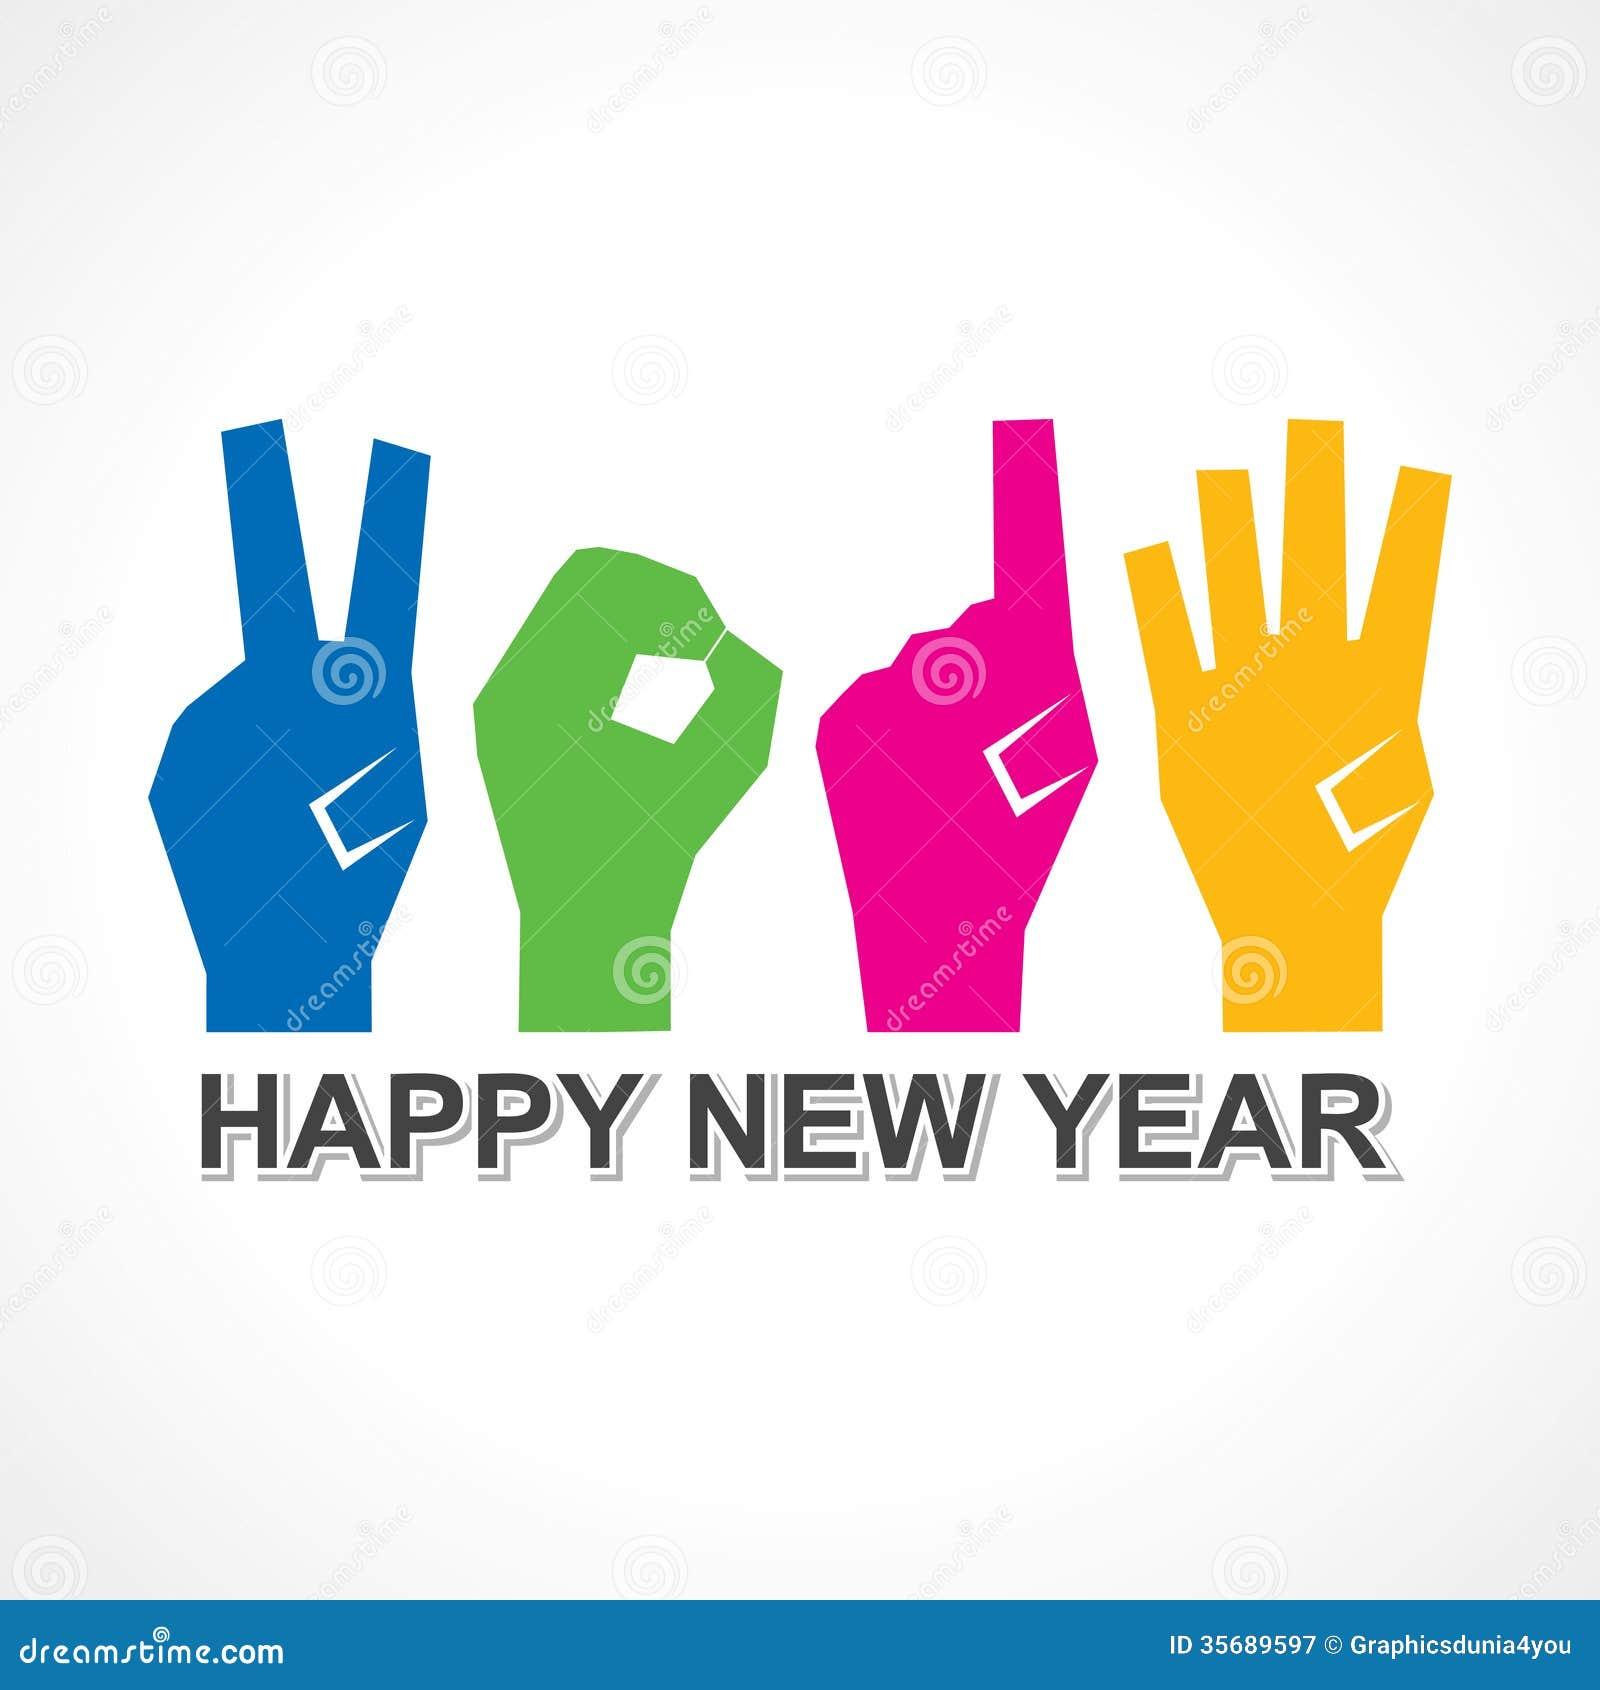 Creative Happy New Year 2014 Design Stock Vector